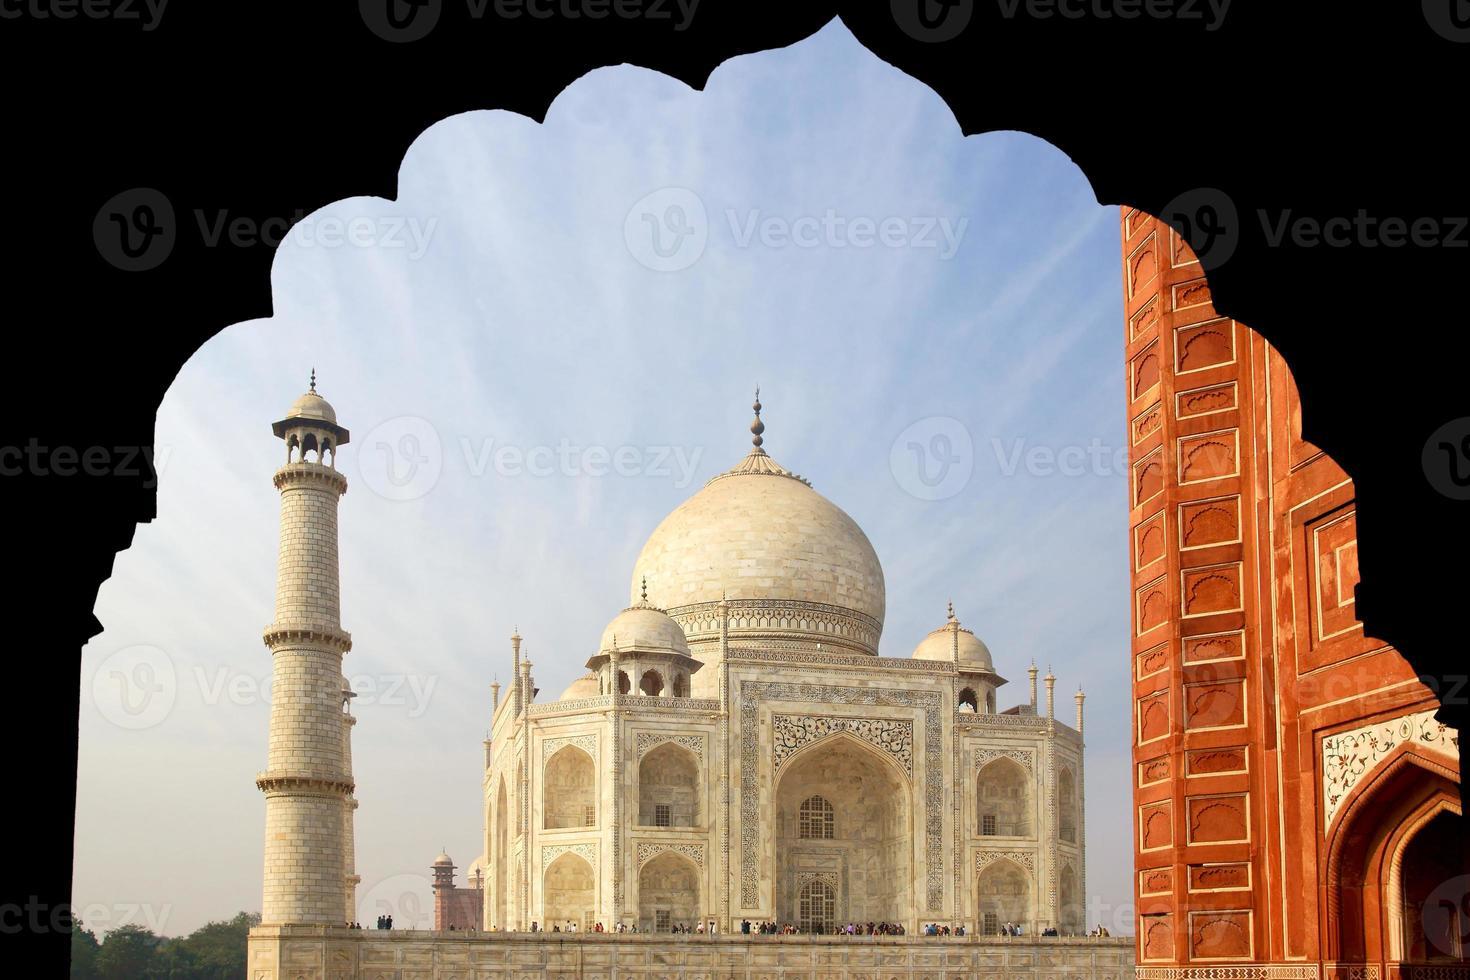 het taj mahal mausoleum van wit marmer. foto